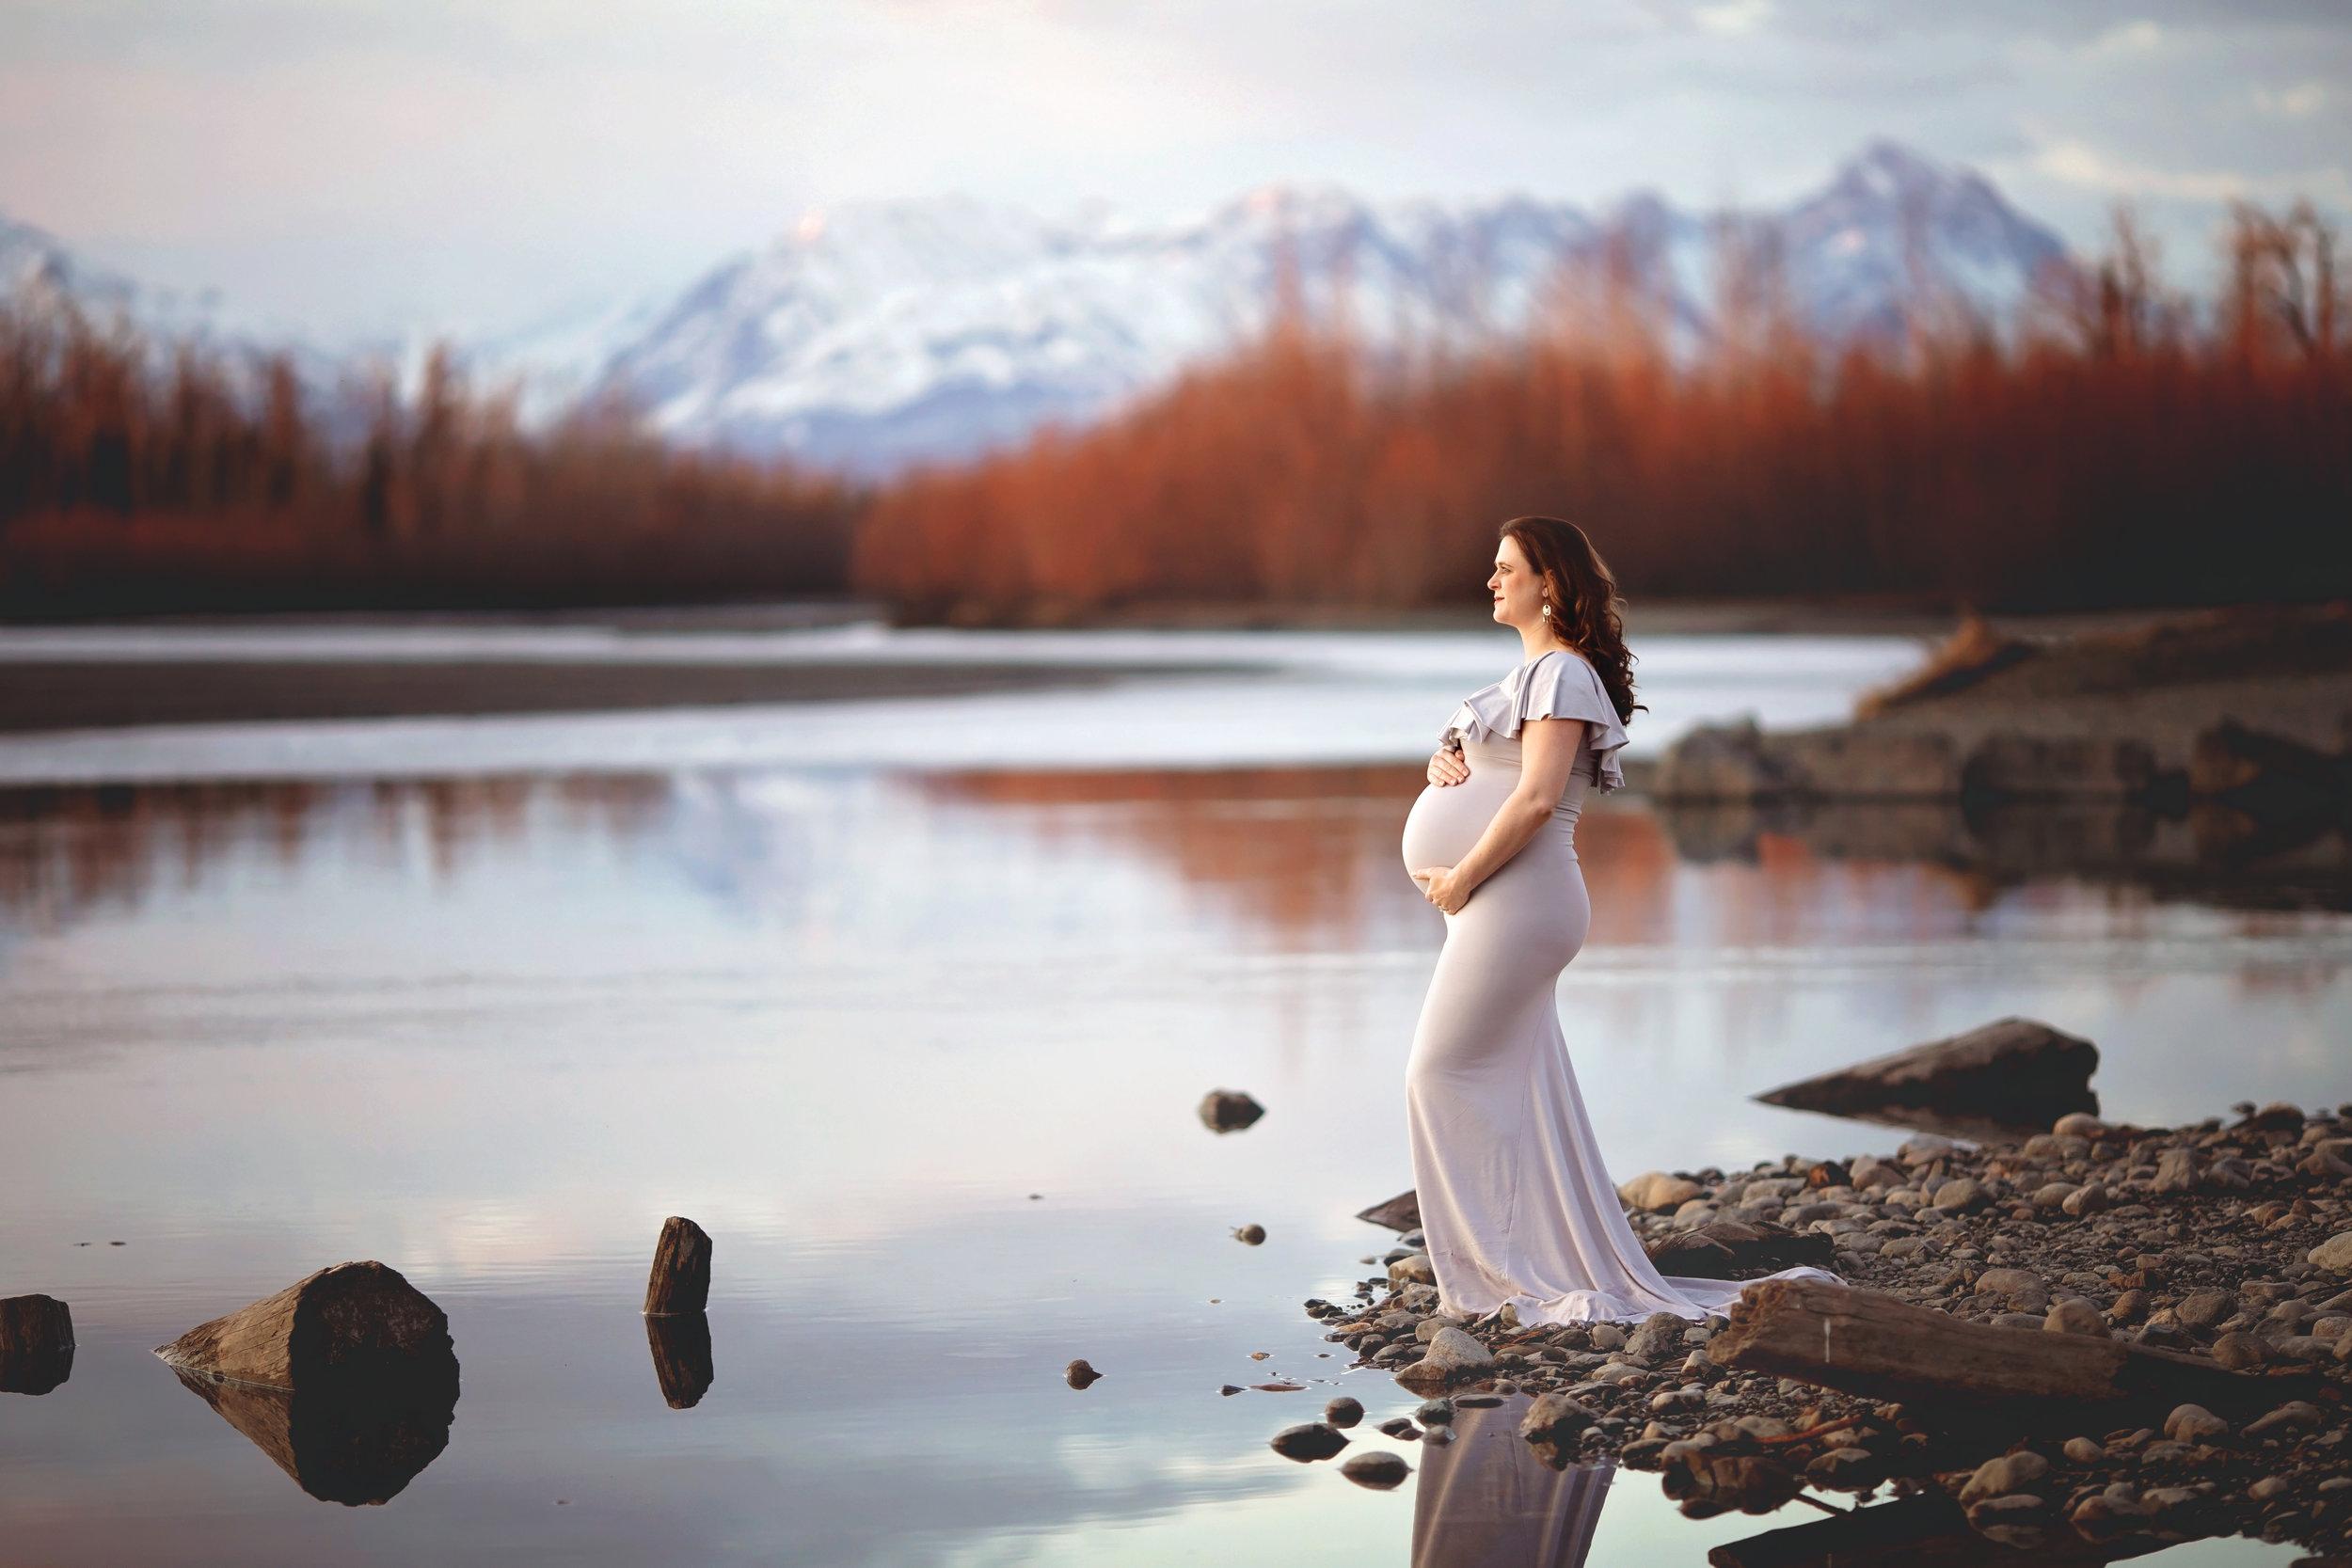 anchorage-maternity-photographer-13.jpg